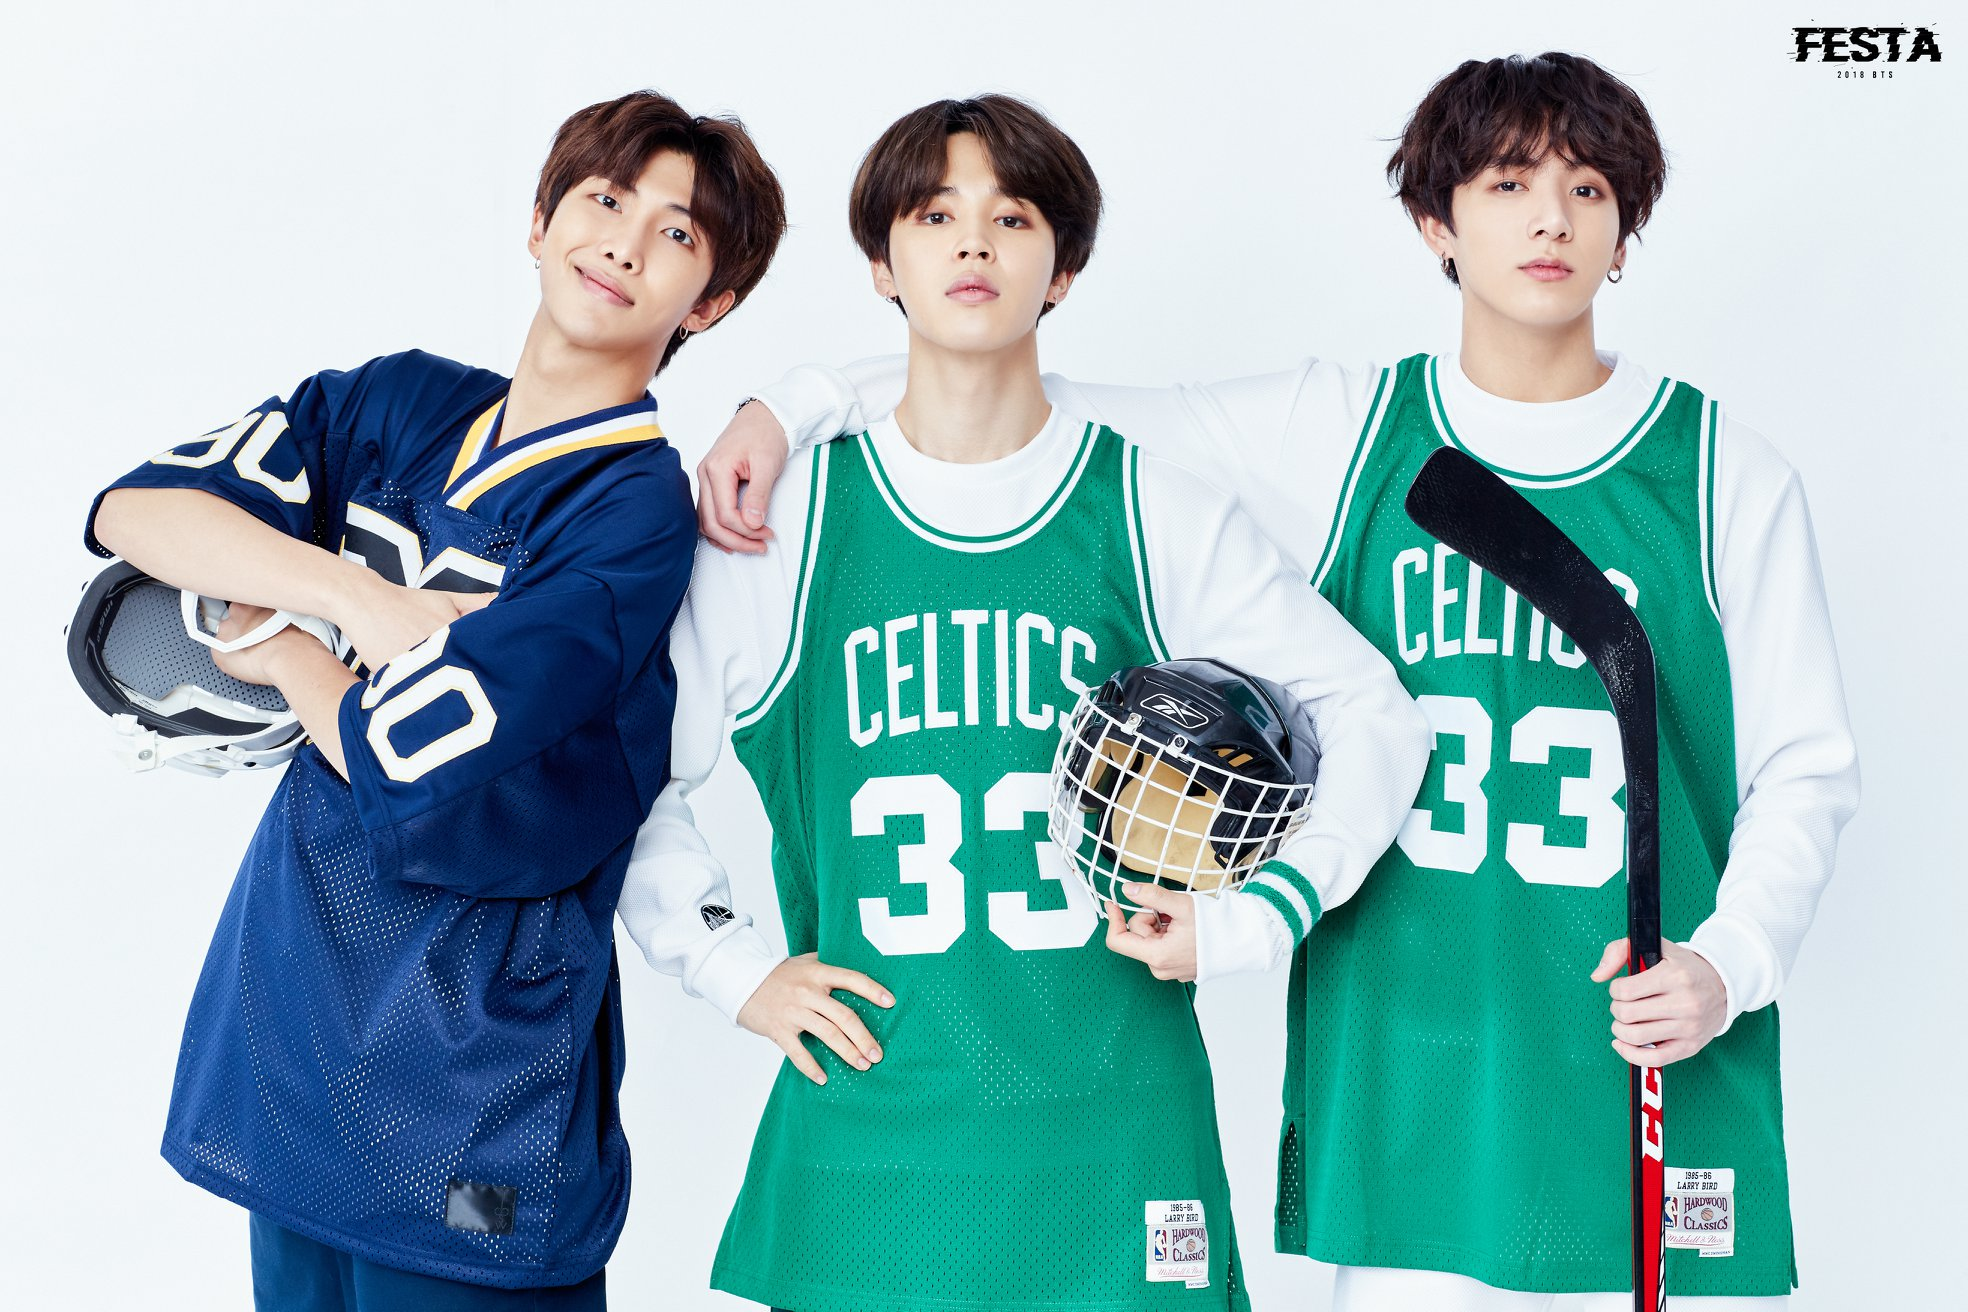 [2018 BTS FESTA] 2018 Bangtan Boys Family Photo (2/2)